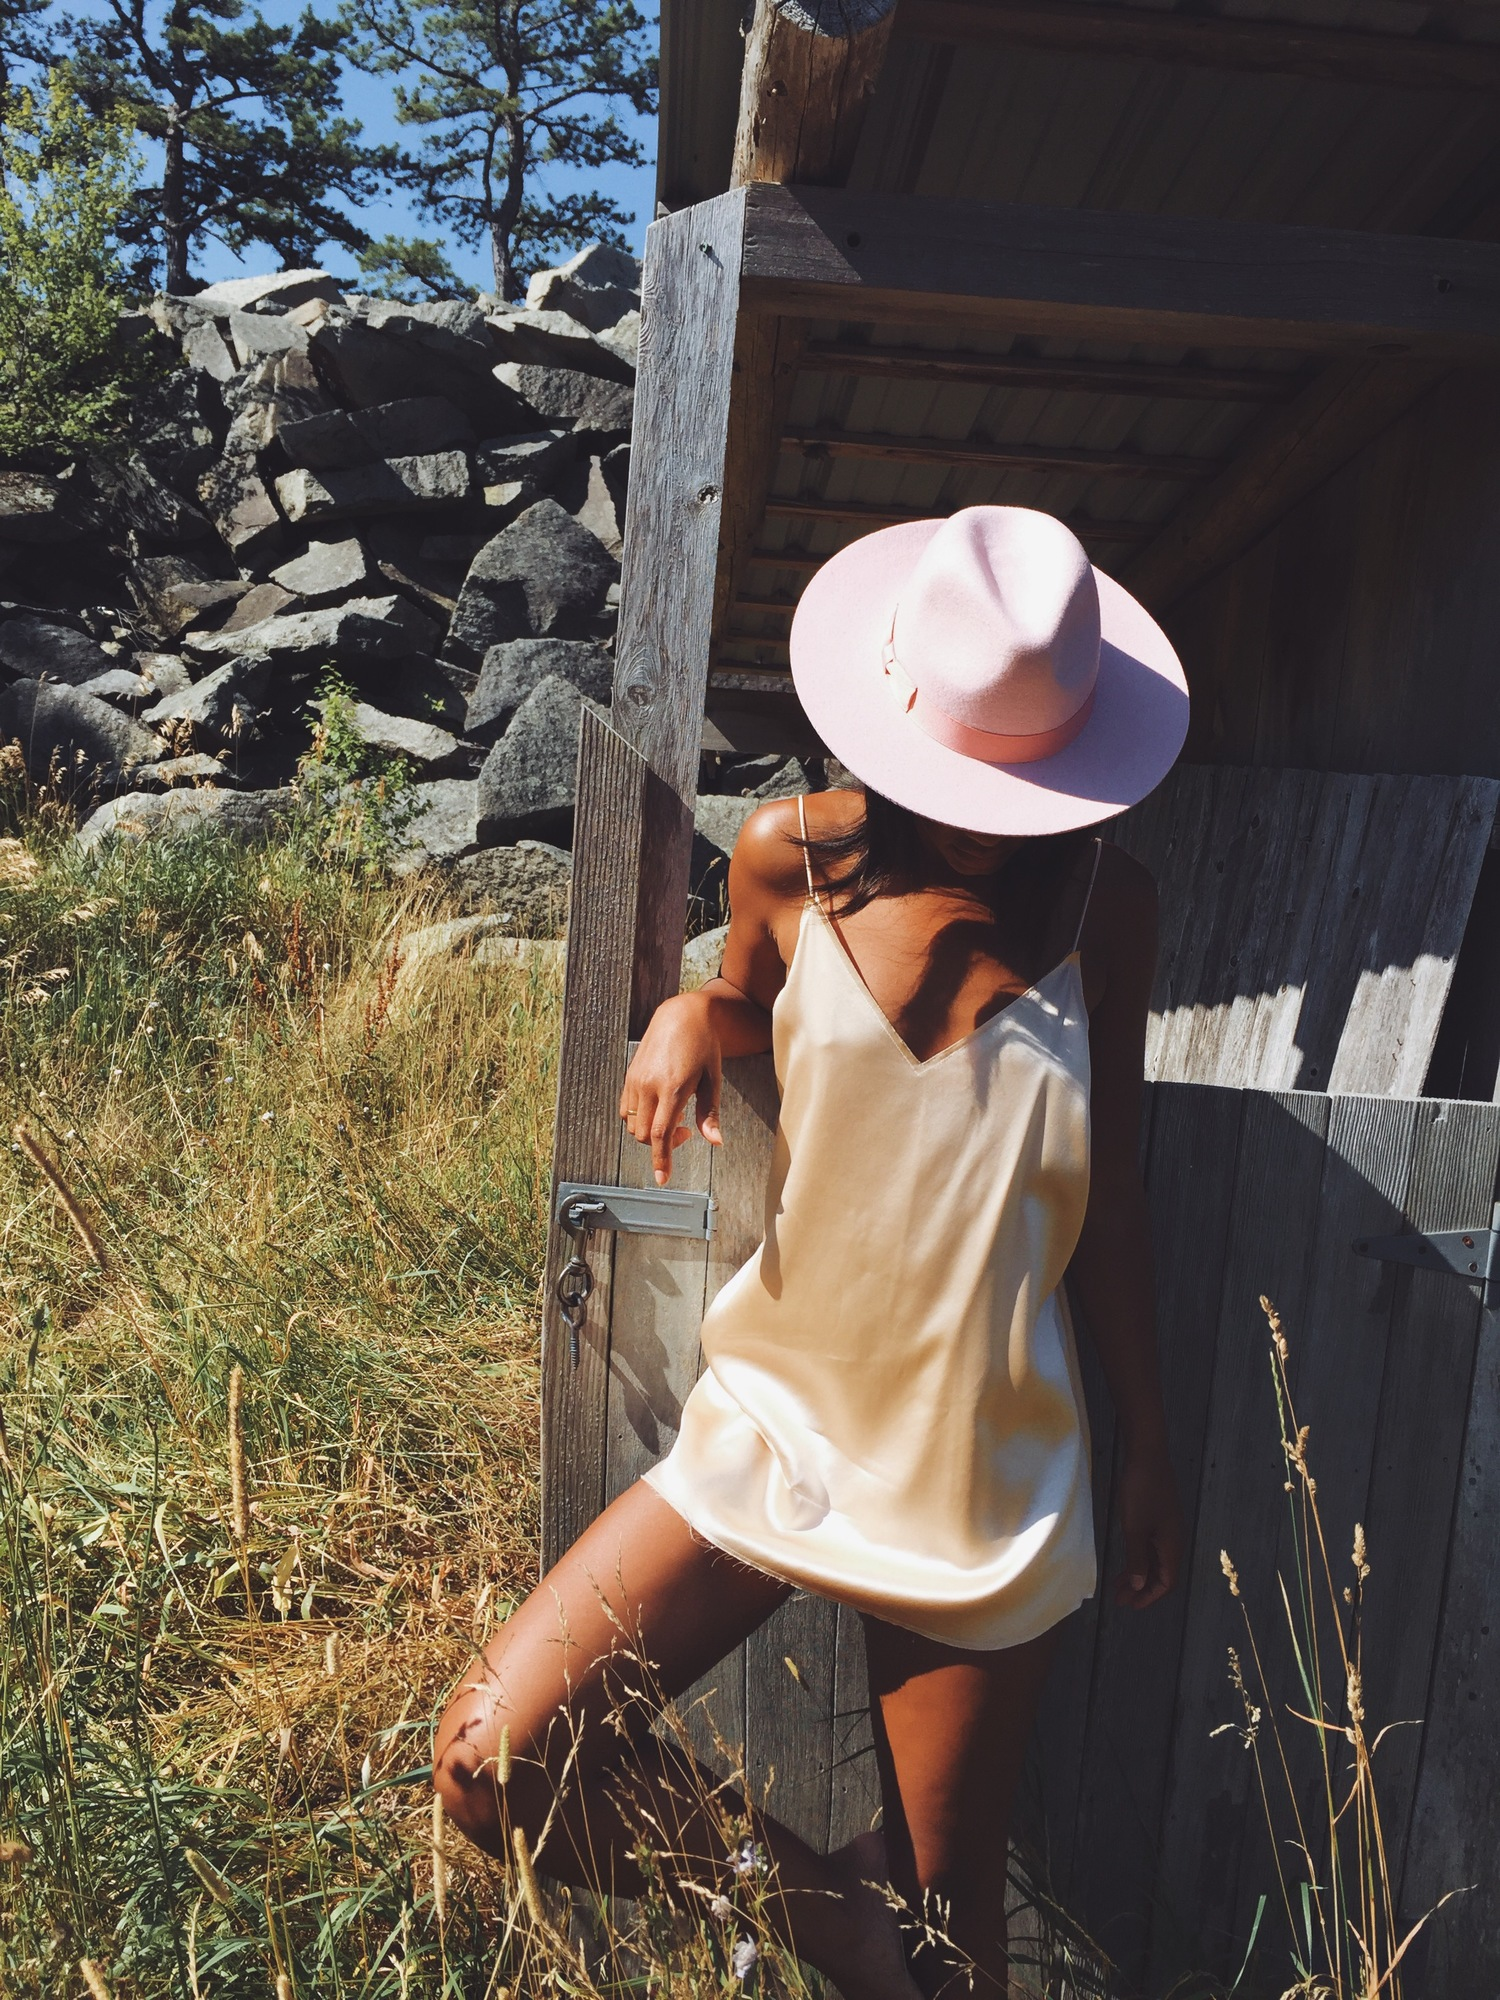 fe9ba8aa32bf6 Slip Dressing Gypsy Farm Feels in Are You Am I — Where I Go  What I Wear